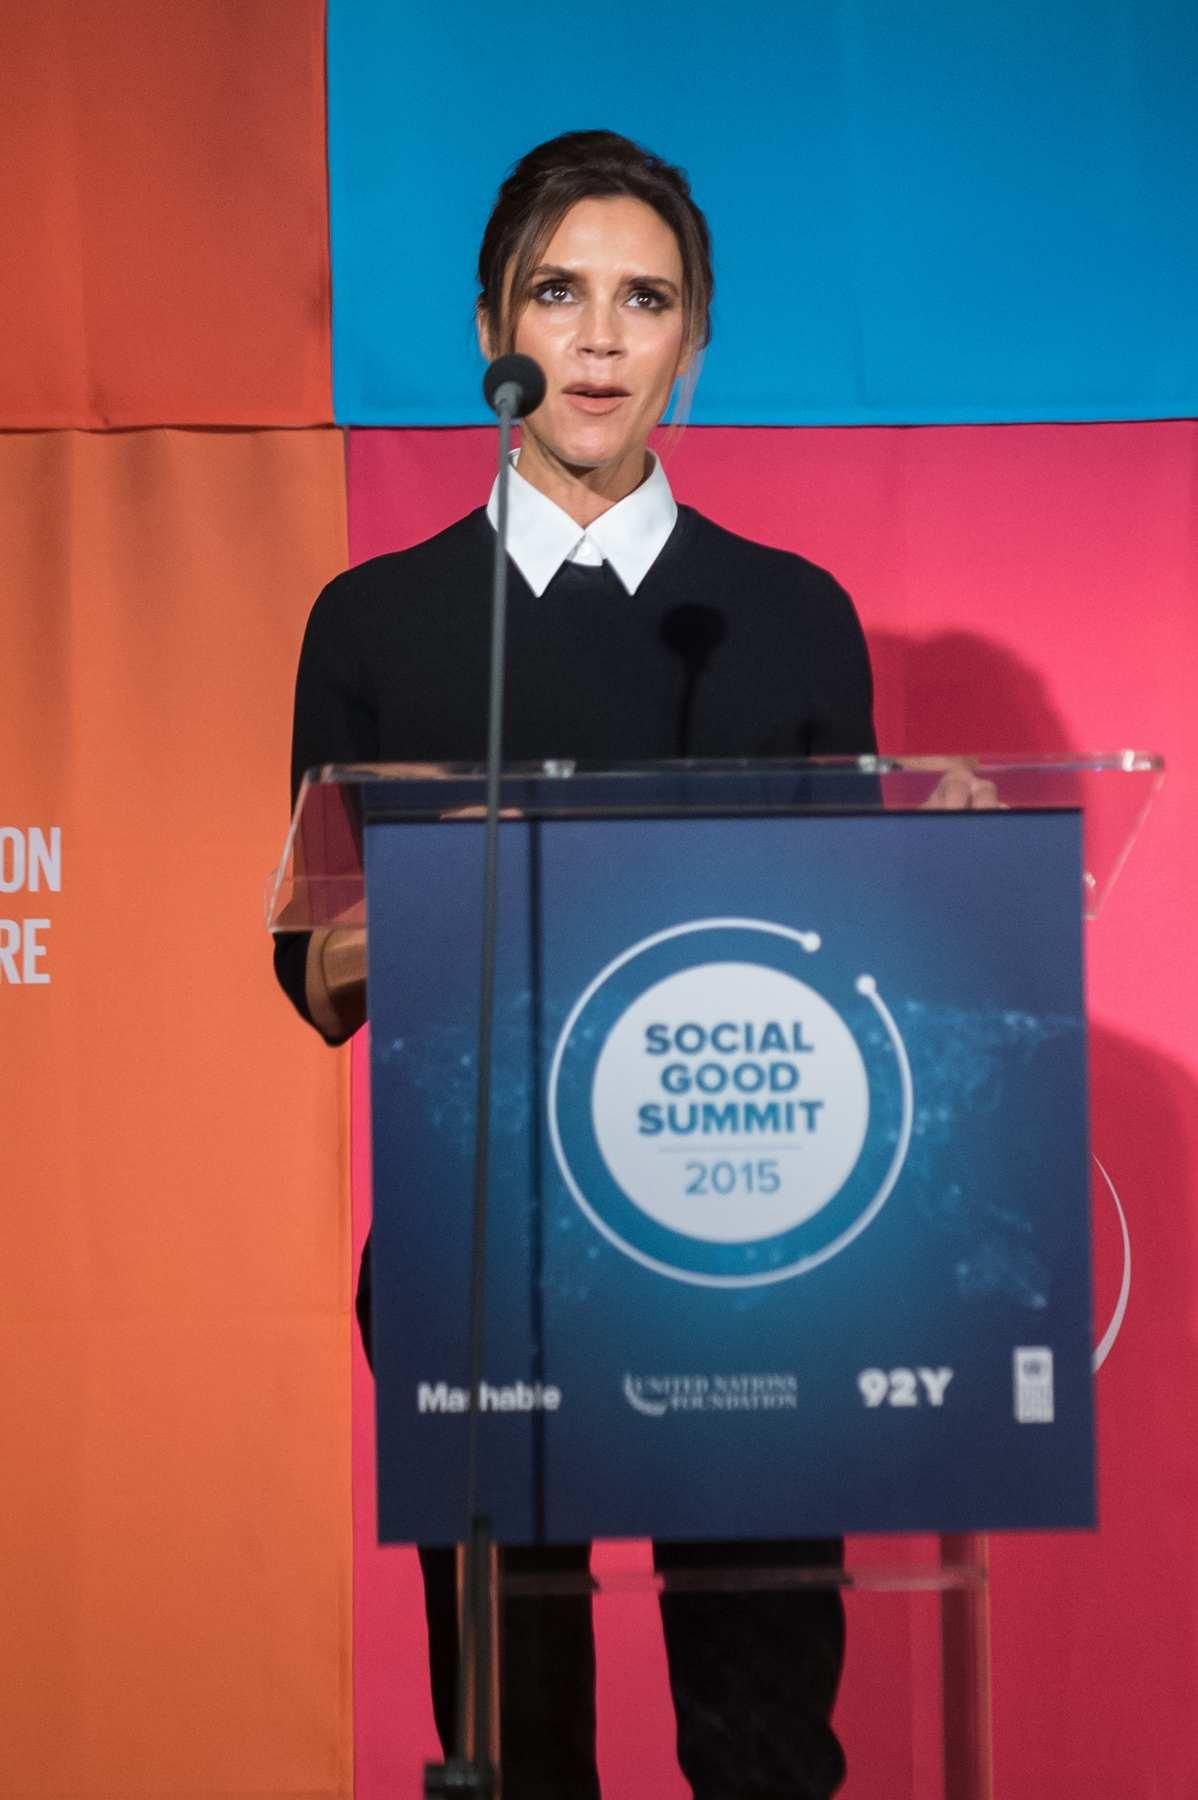 Victoria Beckham Makes Speech at Social Good Summit-1